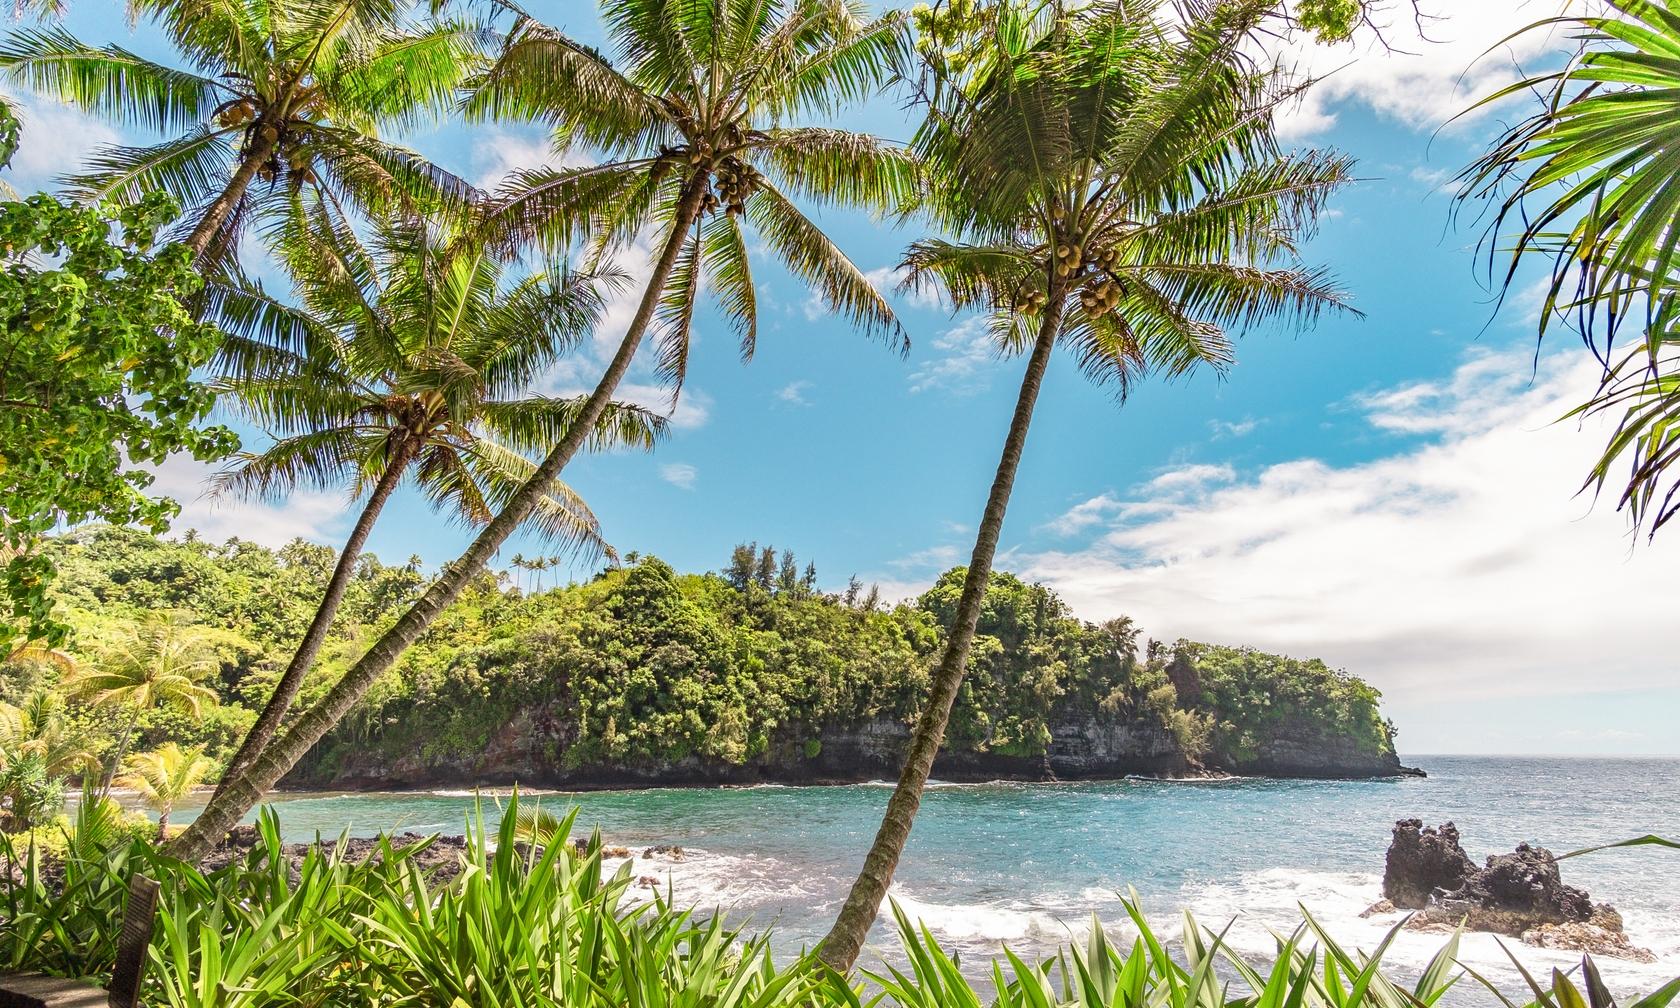 Vacation rentals in Hilo